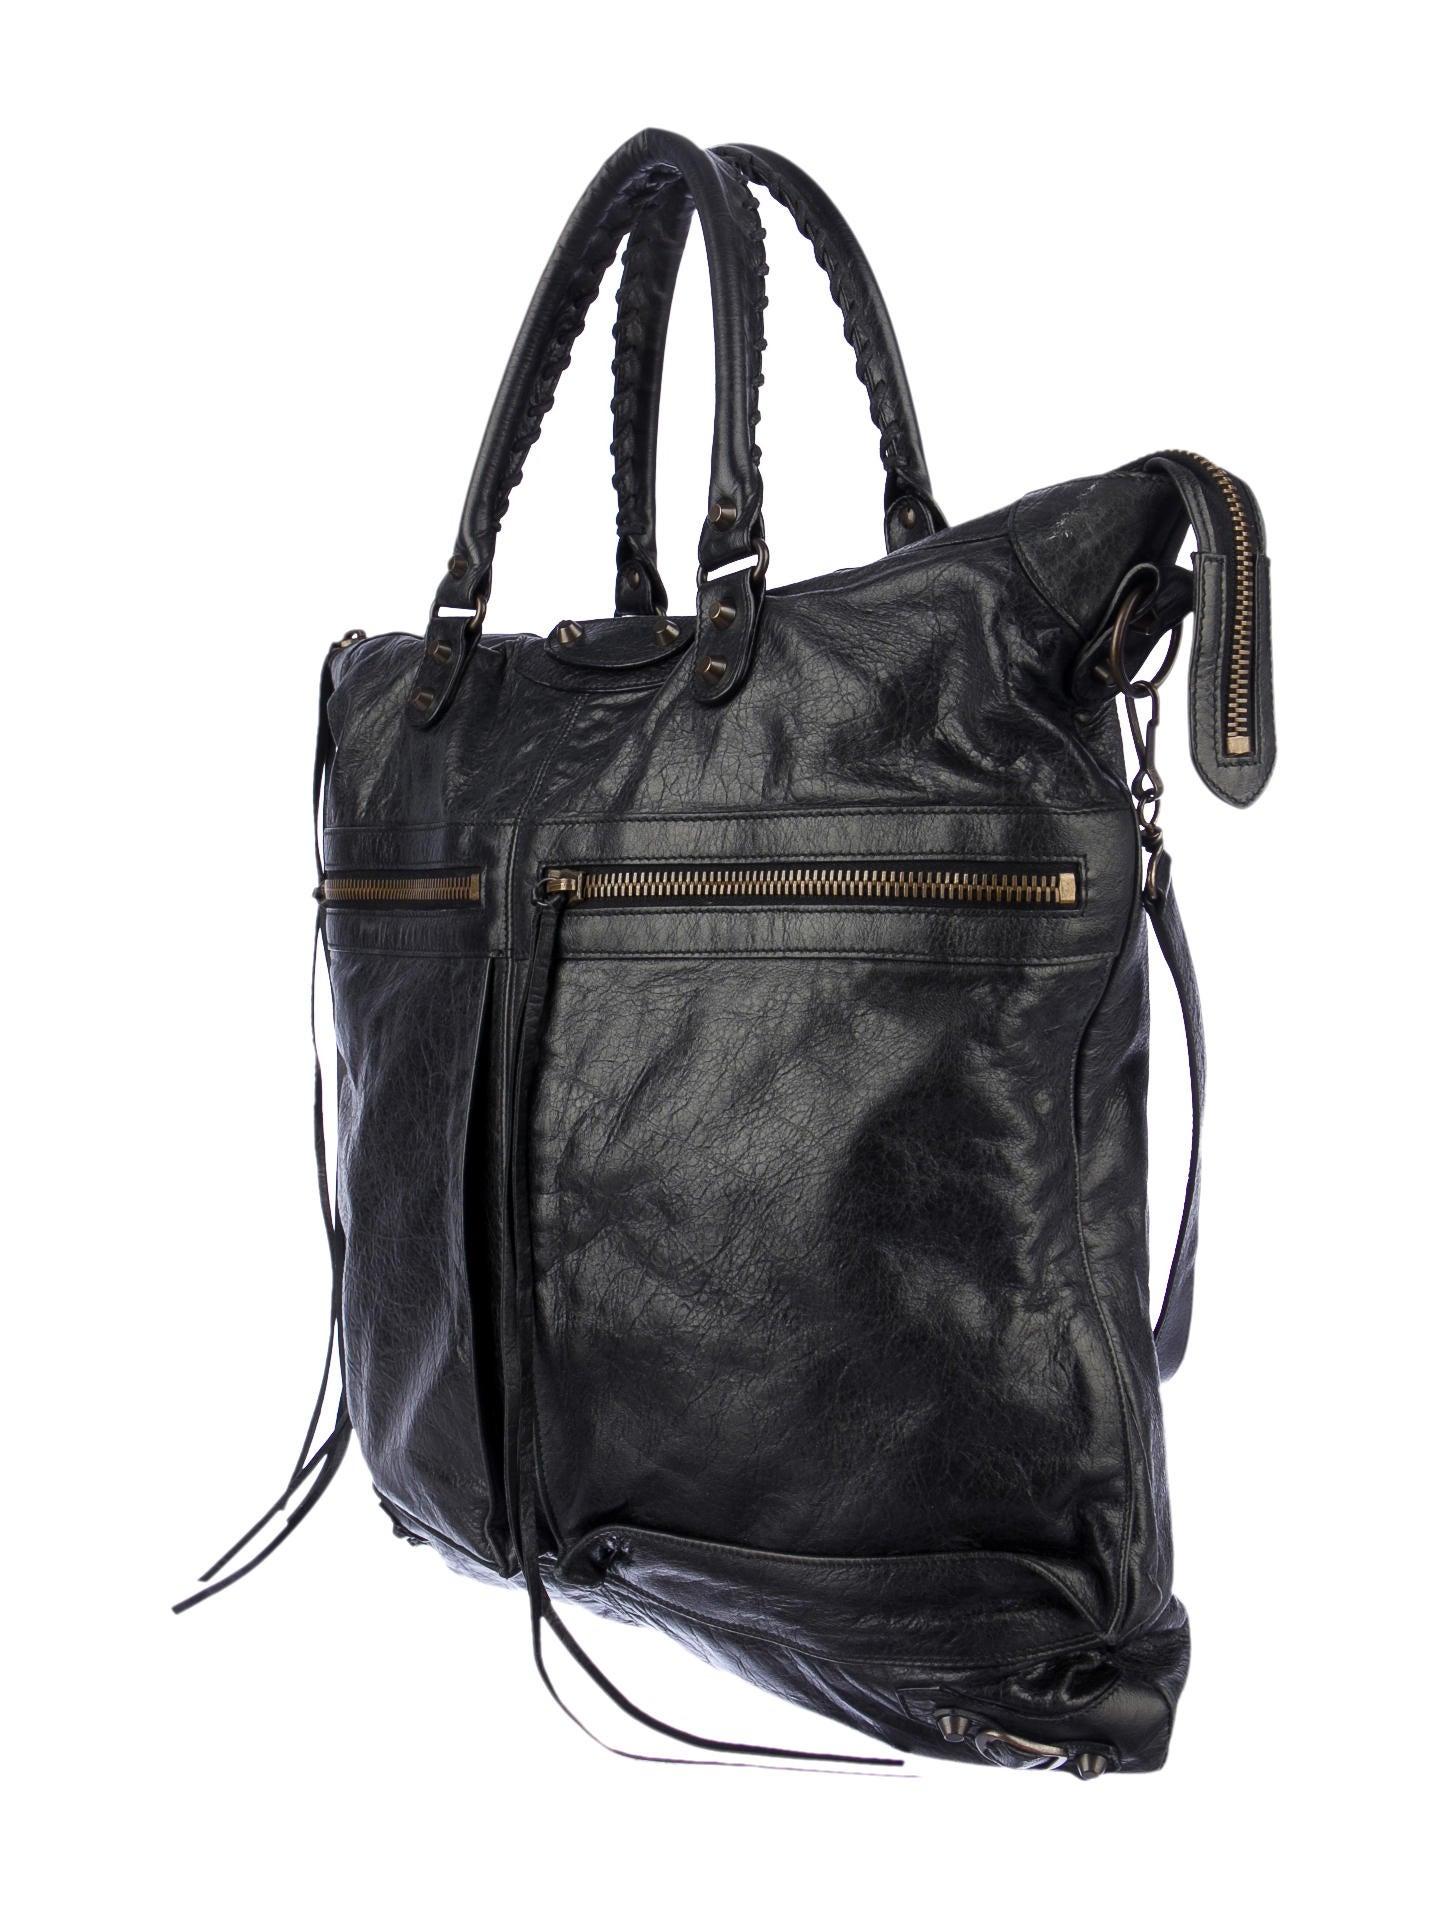 f91f3a87cf Balenciaga Motocross Classic Square Bag - Handbags - BAL24609 | The ...